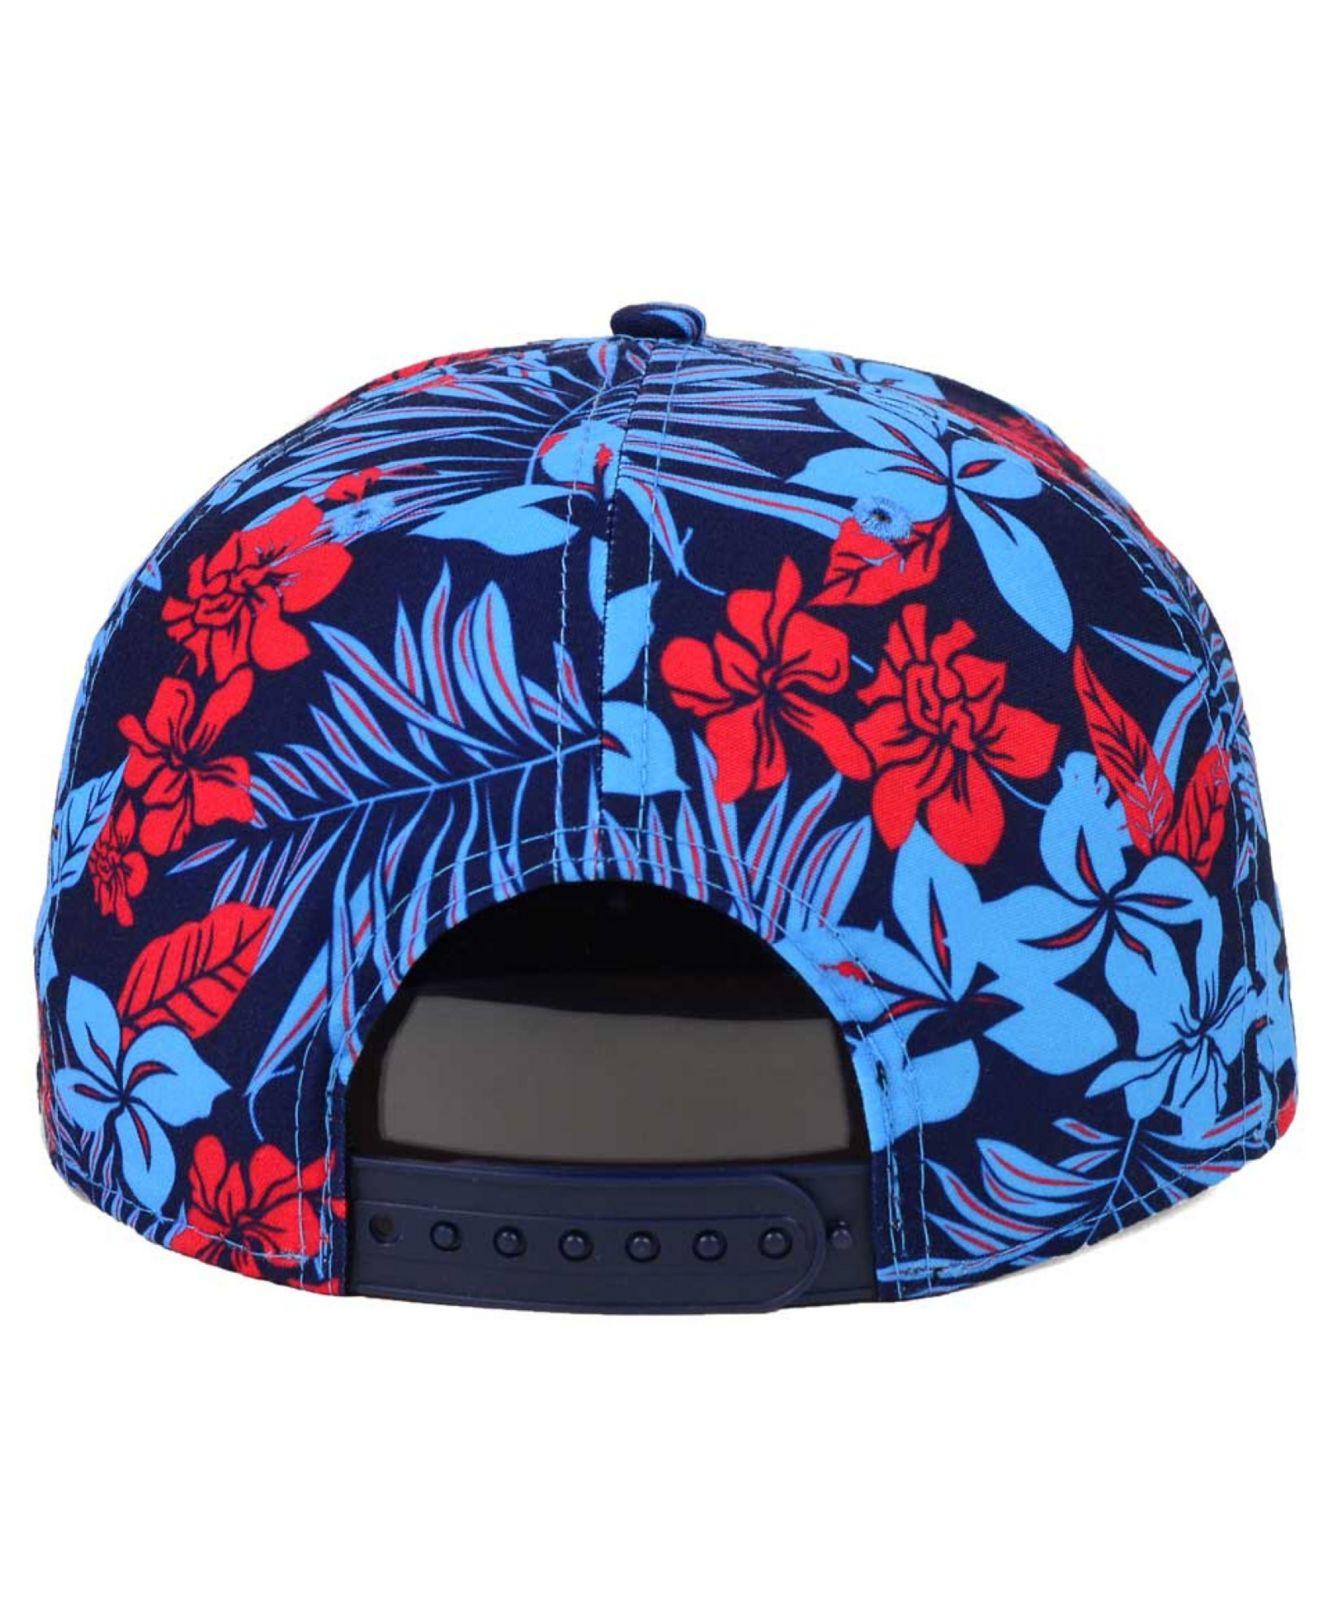 d4799684b6b027 ... 50% off lyst ktz tennessee titans wowie snapback cap in blue for men  f5d45 94d84